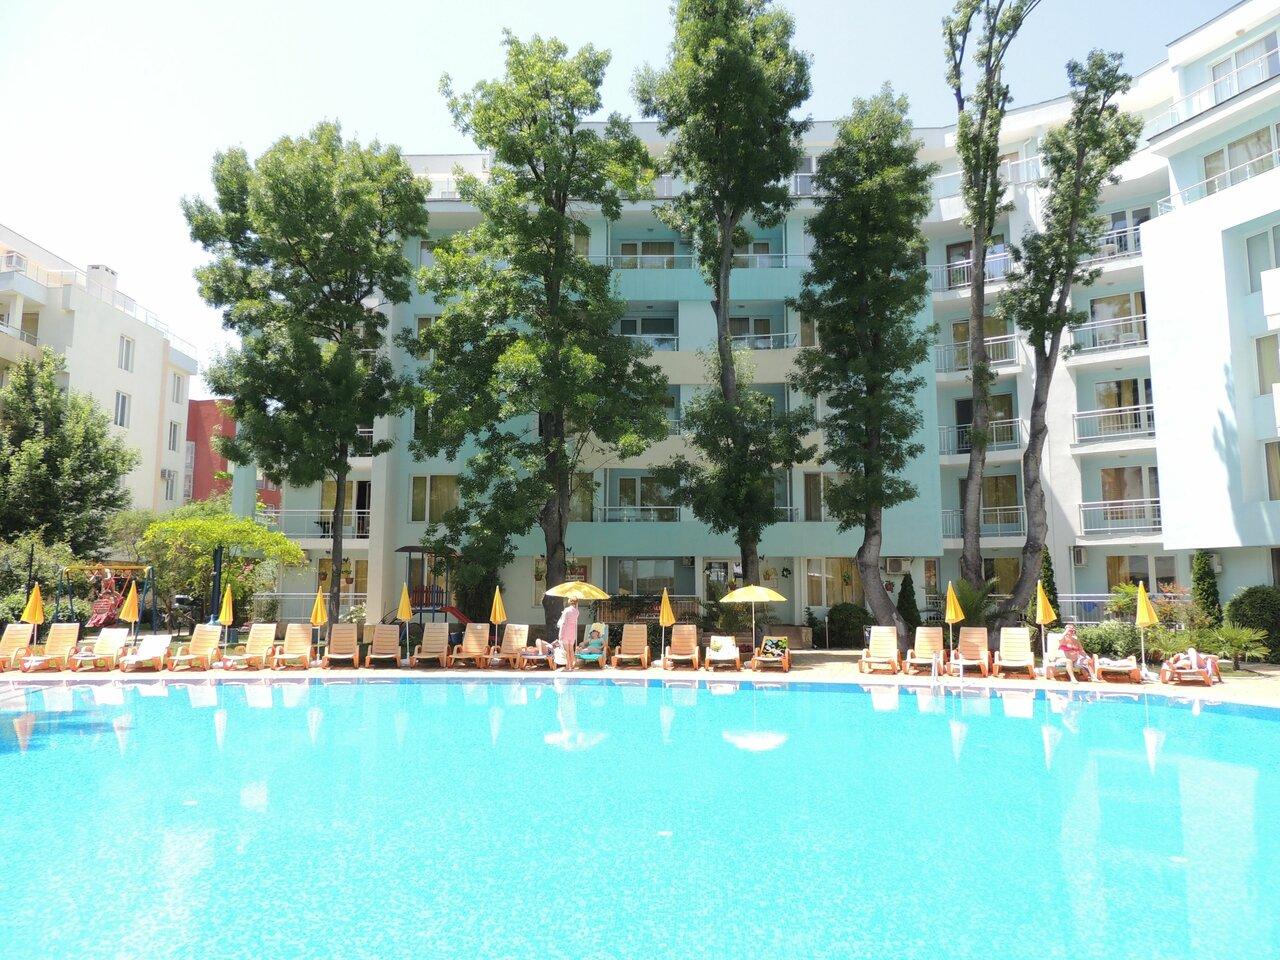 Yassen Holiday Village